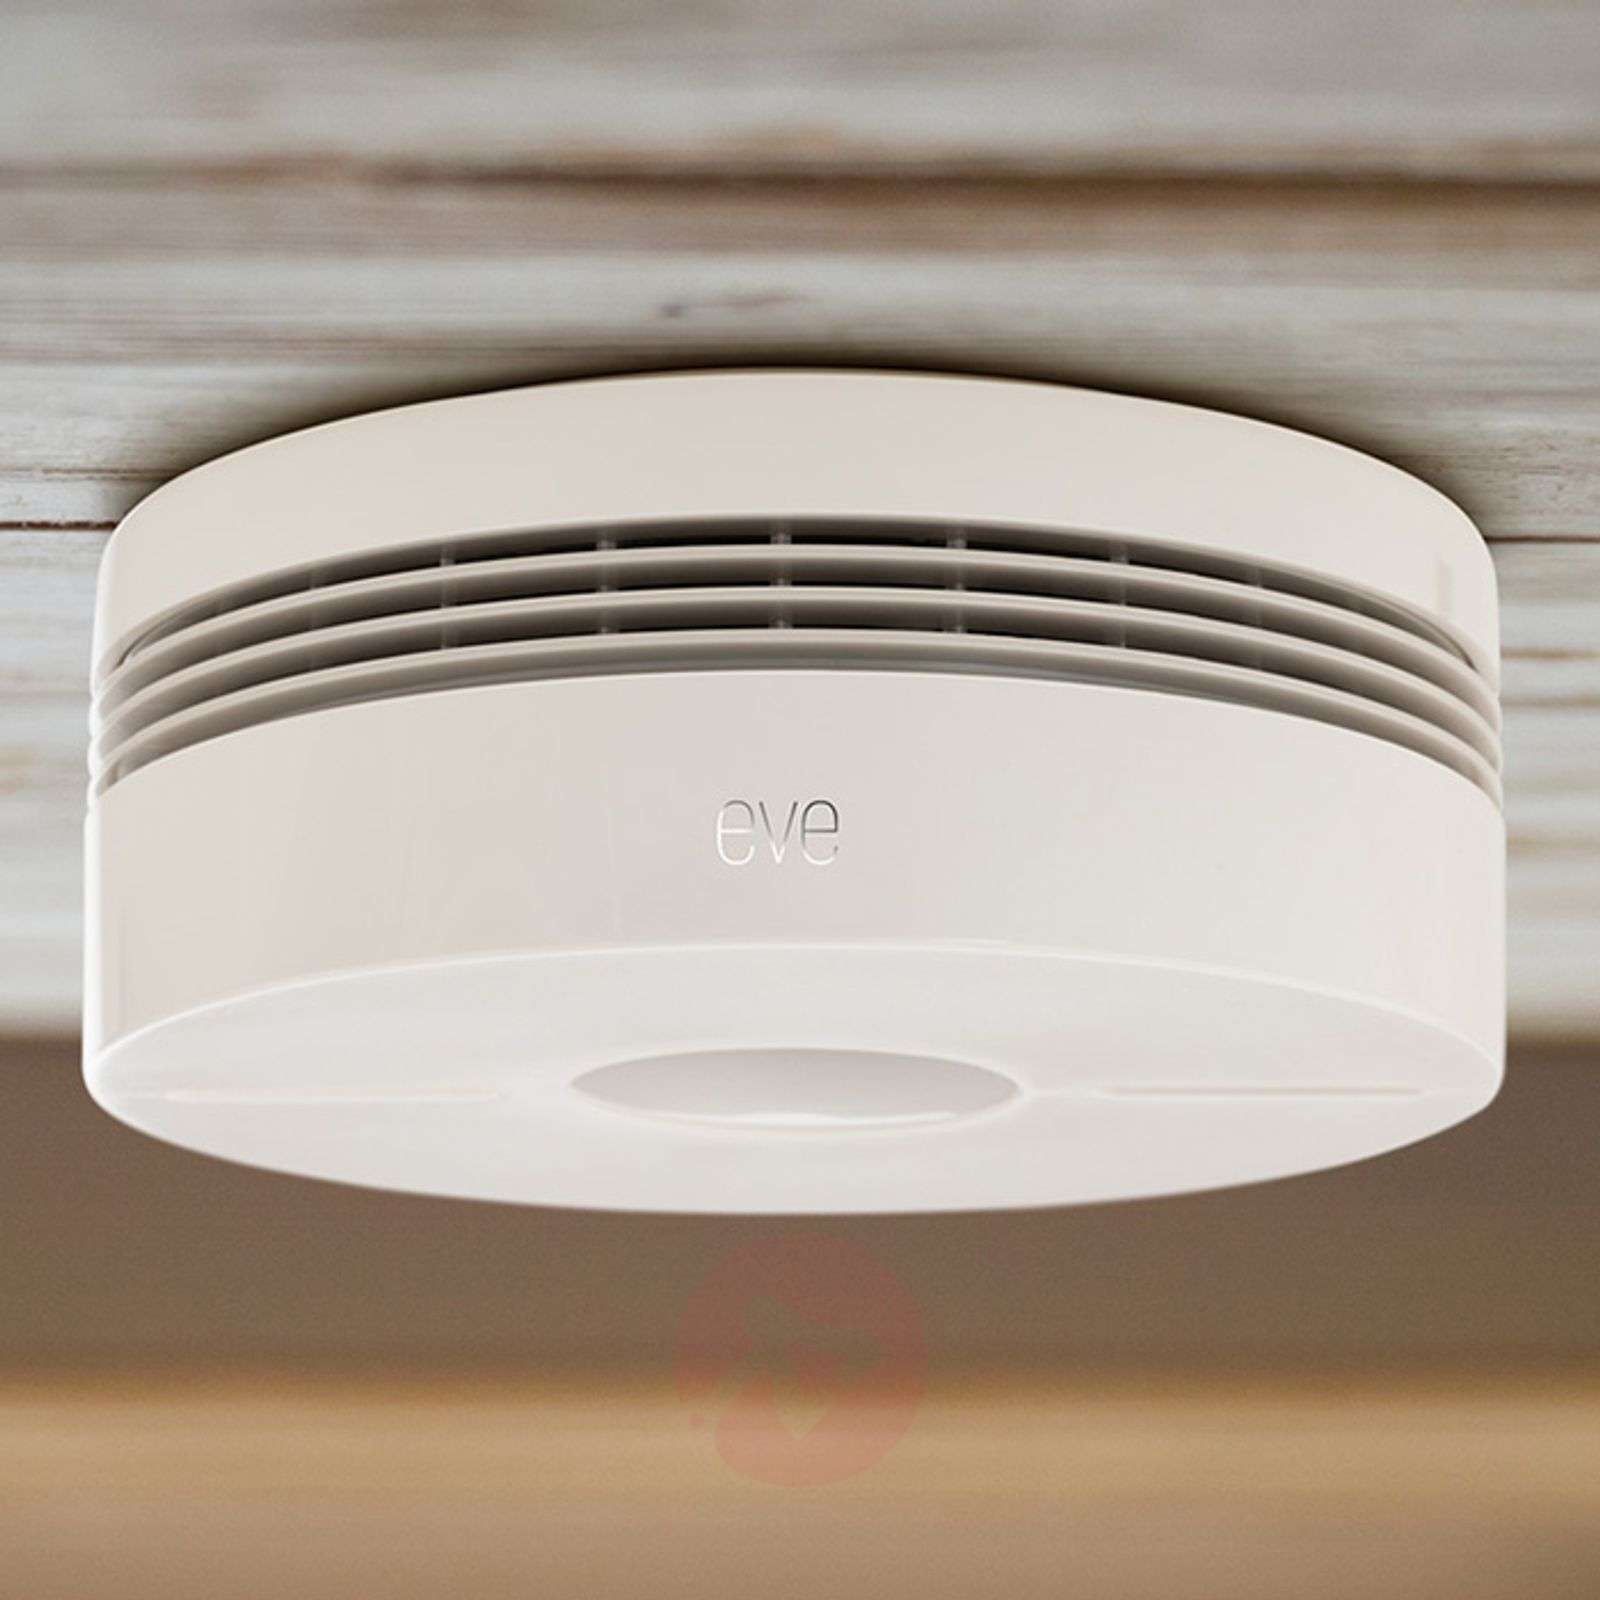 Eve Smoke Smart Home savunilmaisin-2029007-01